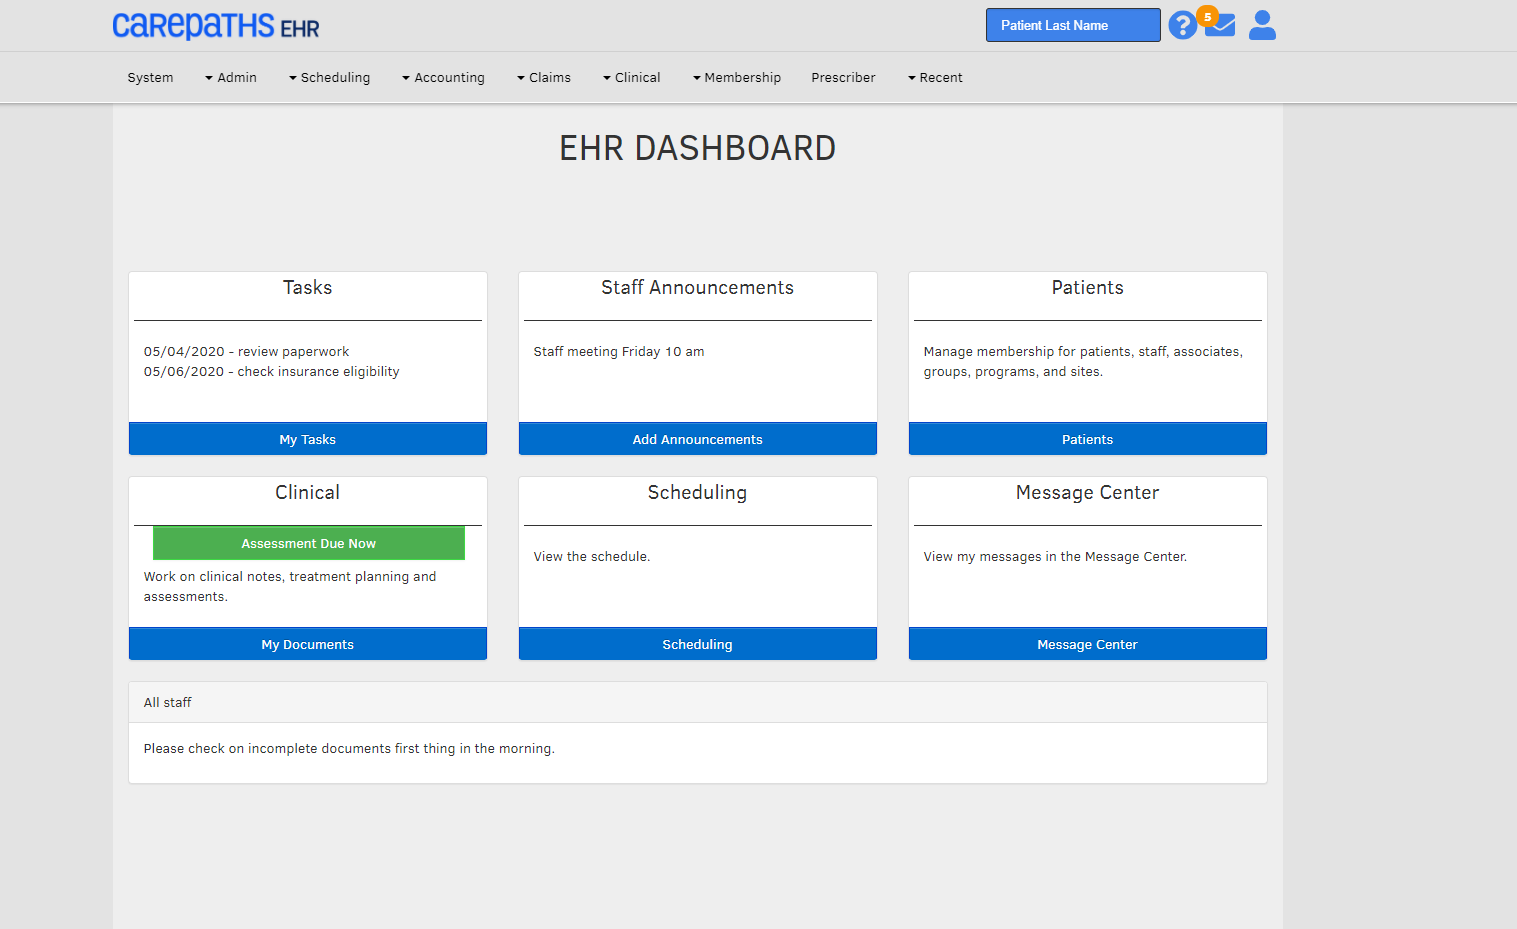 CarePaths EHR Software - CarePaths EHR Dashboard